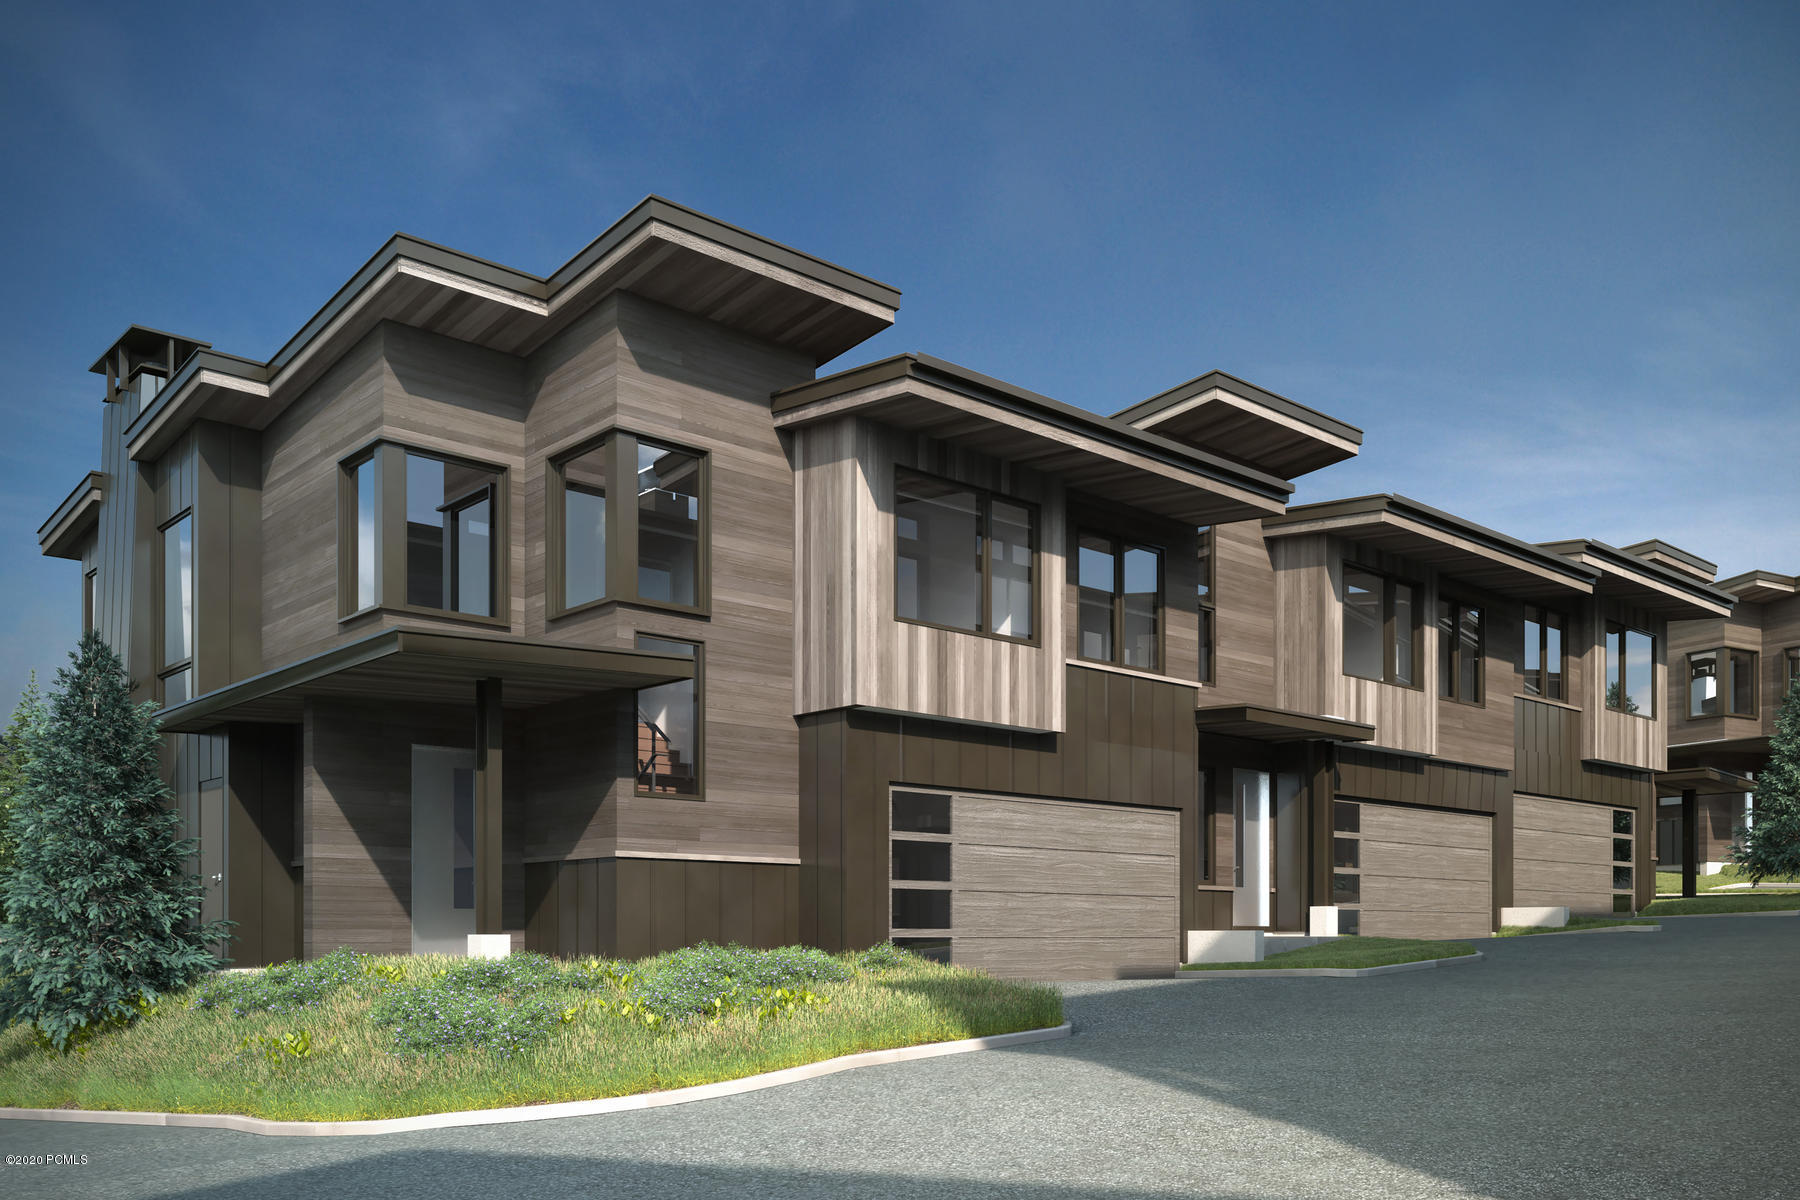 3576 Ridgeline Drive, Park City, Utah 84098, 5 Bedrooms Bedrooms, ,6 BathroomsBathrooms,Condominium,For Sale,Ridgeline,20190109112430415765000000